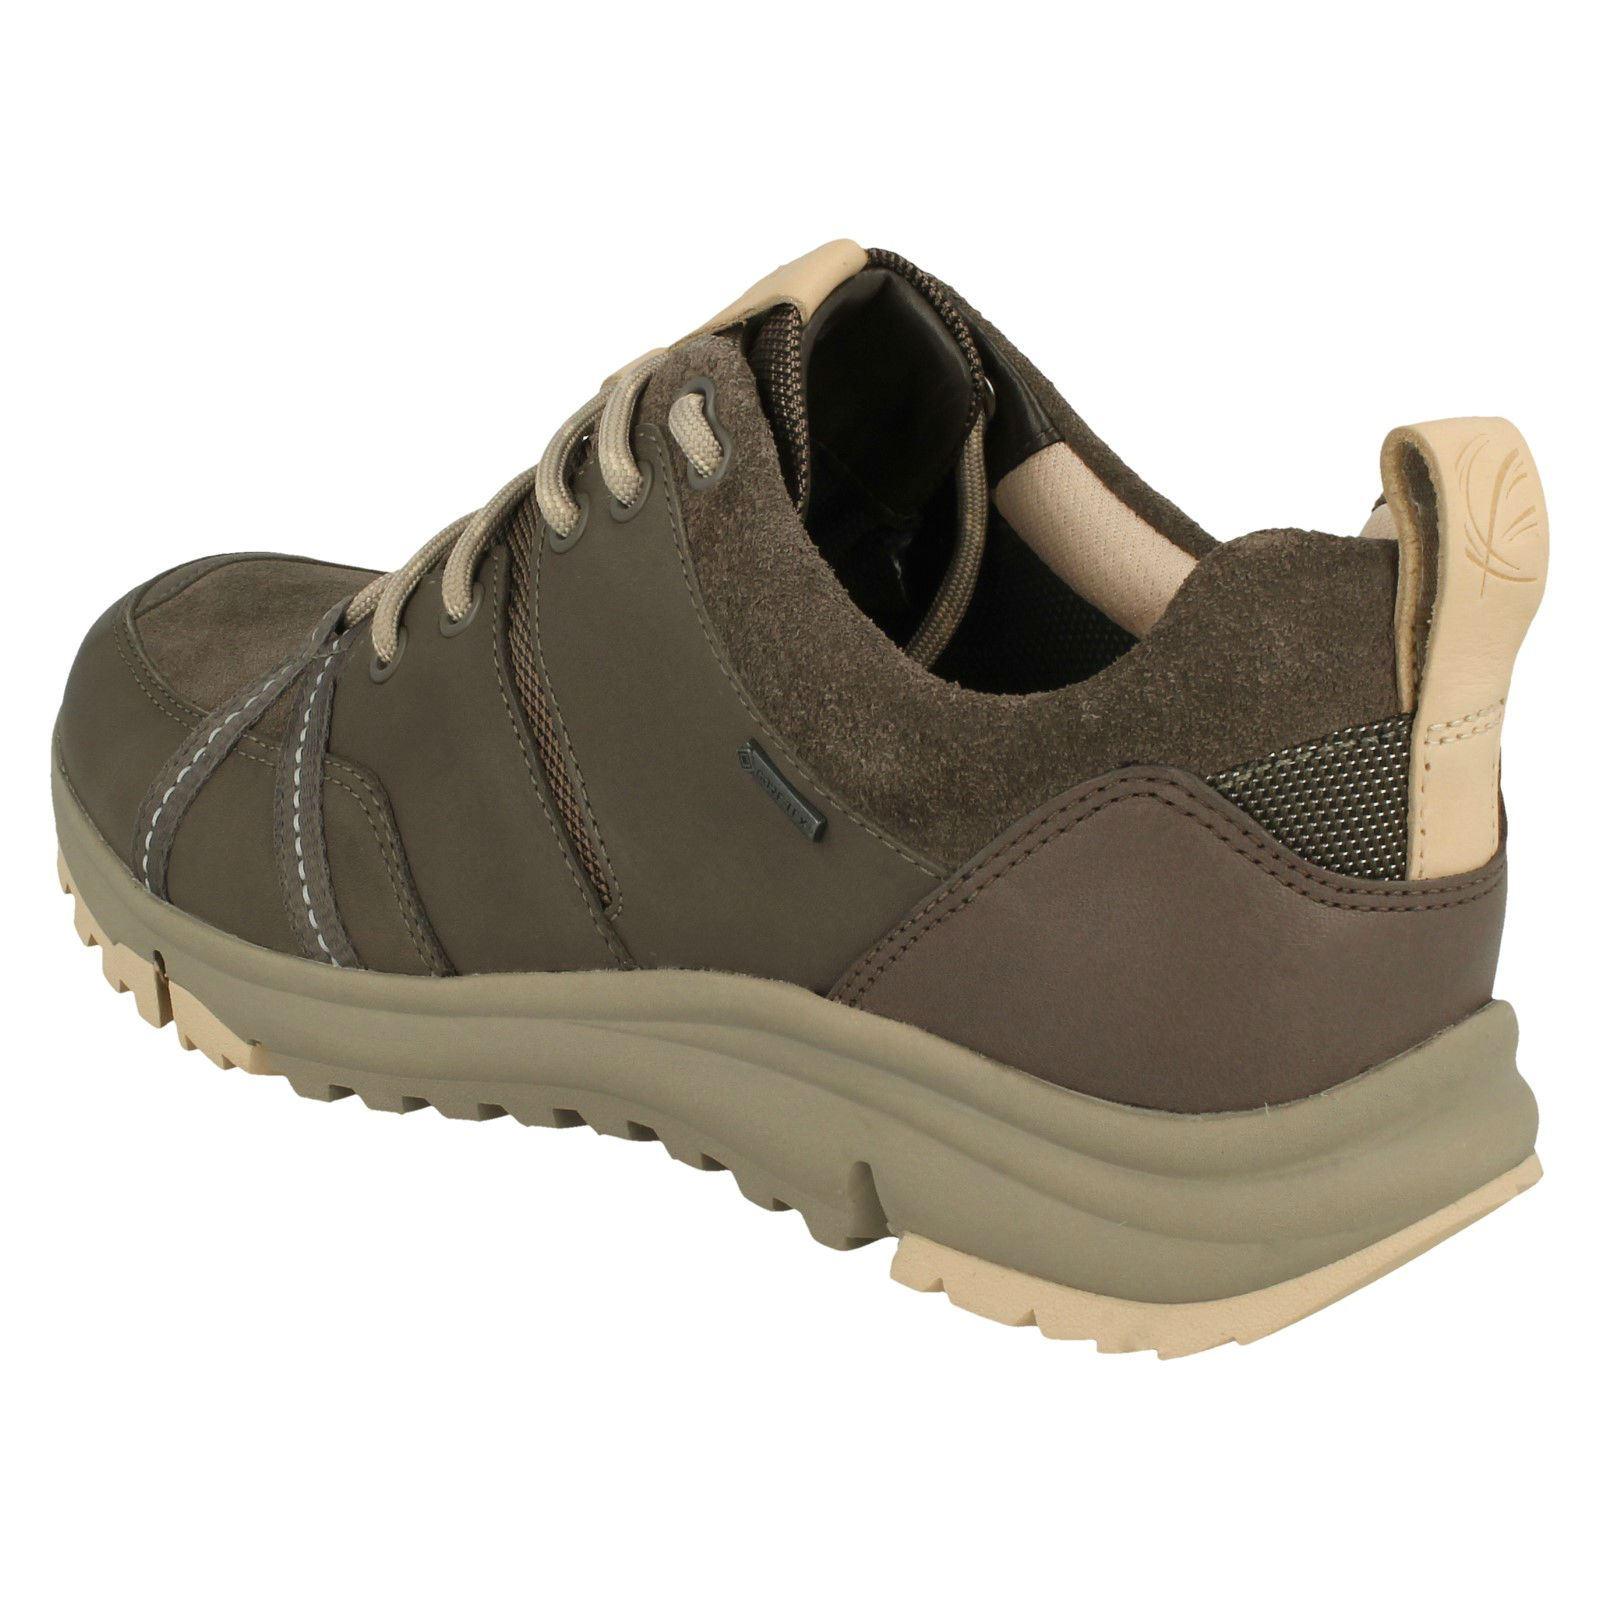 Womens Clarks Clarks Clarks Trainer Style shoes 'Tri Trek Gtx' 9ead31